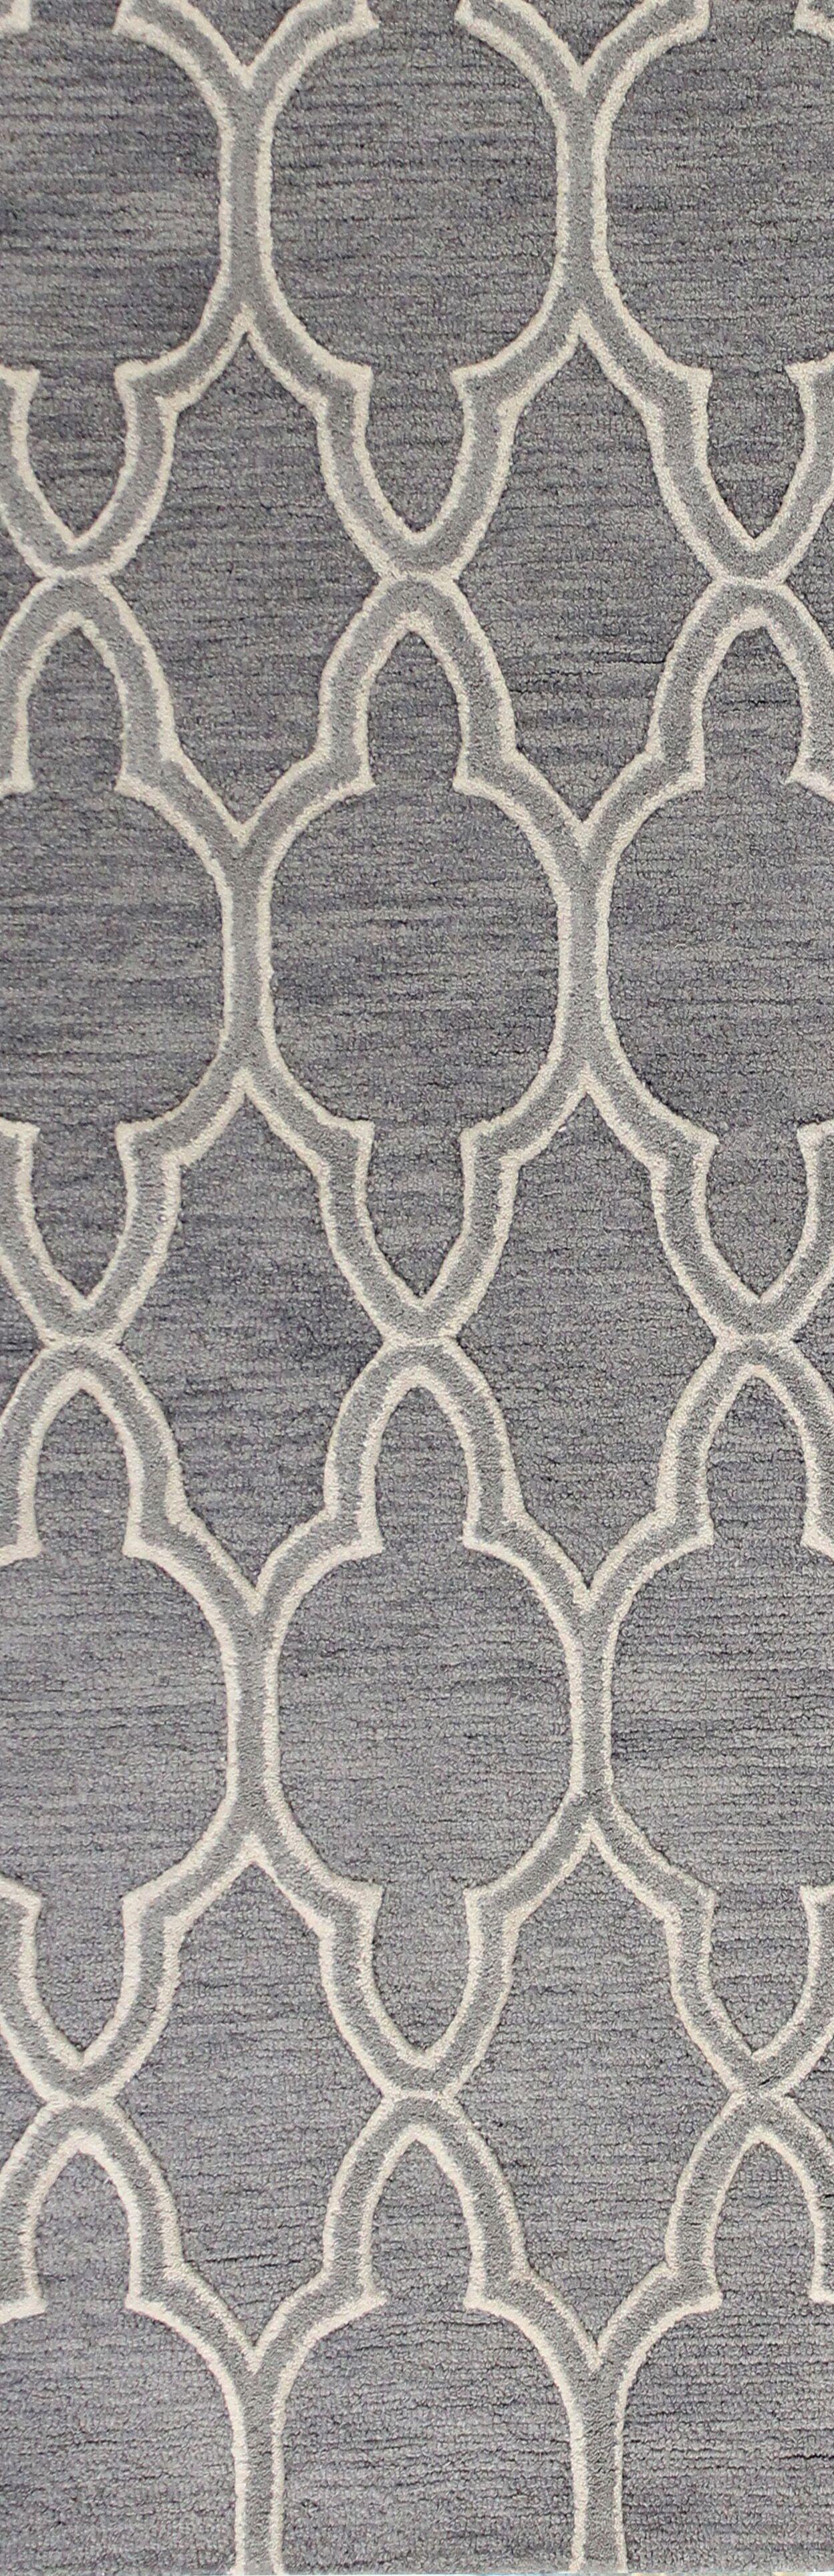 Octavia Hand-Tufted Grey Area Rug Rug Size: Runner 2'6